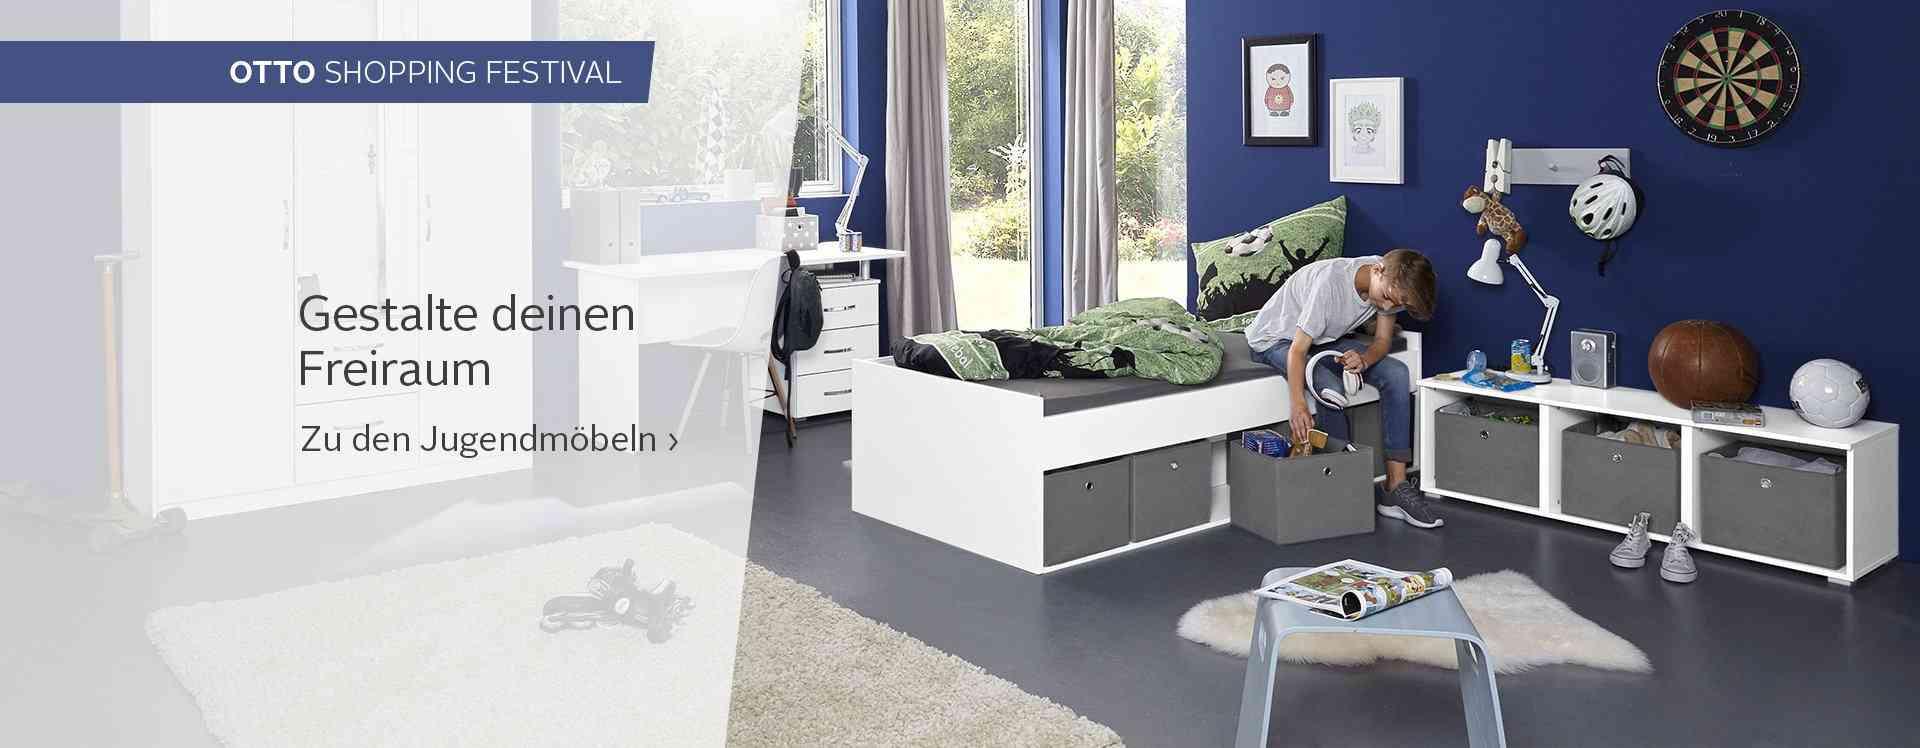 kinderzimmer kinderzimmerm bel online kaufen otto. Black Bedroom Furniture Sets. Home Design Ideas